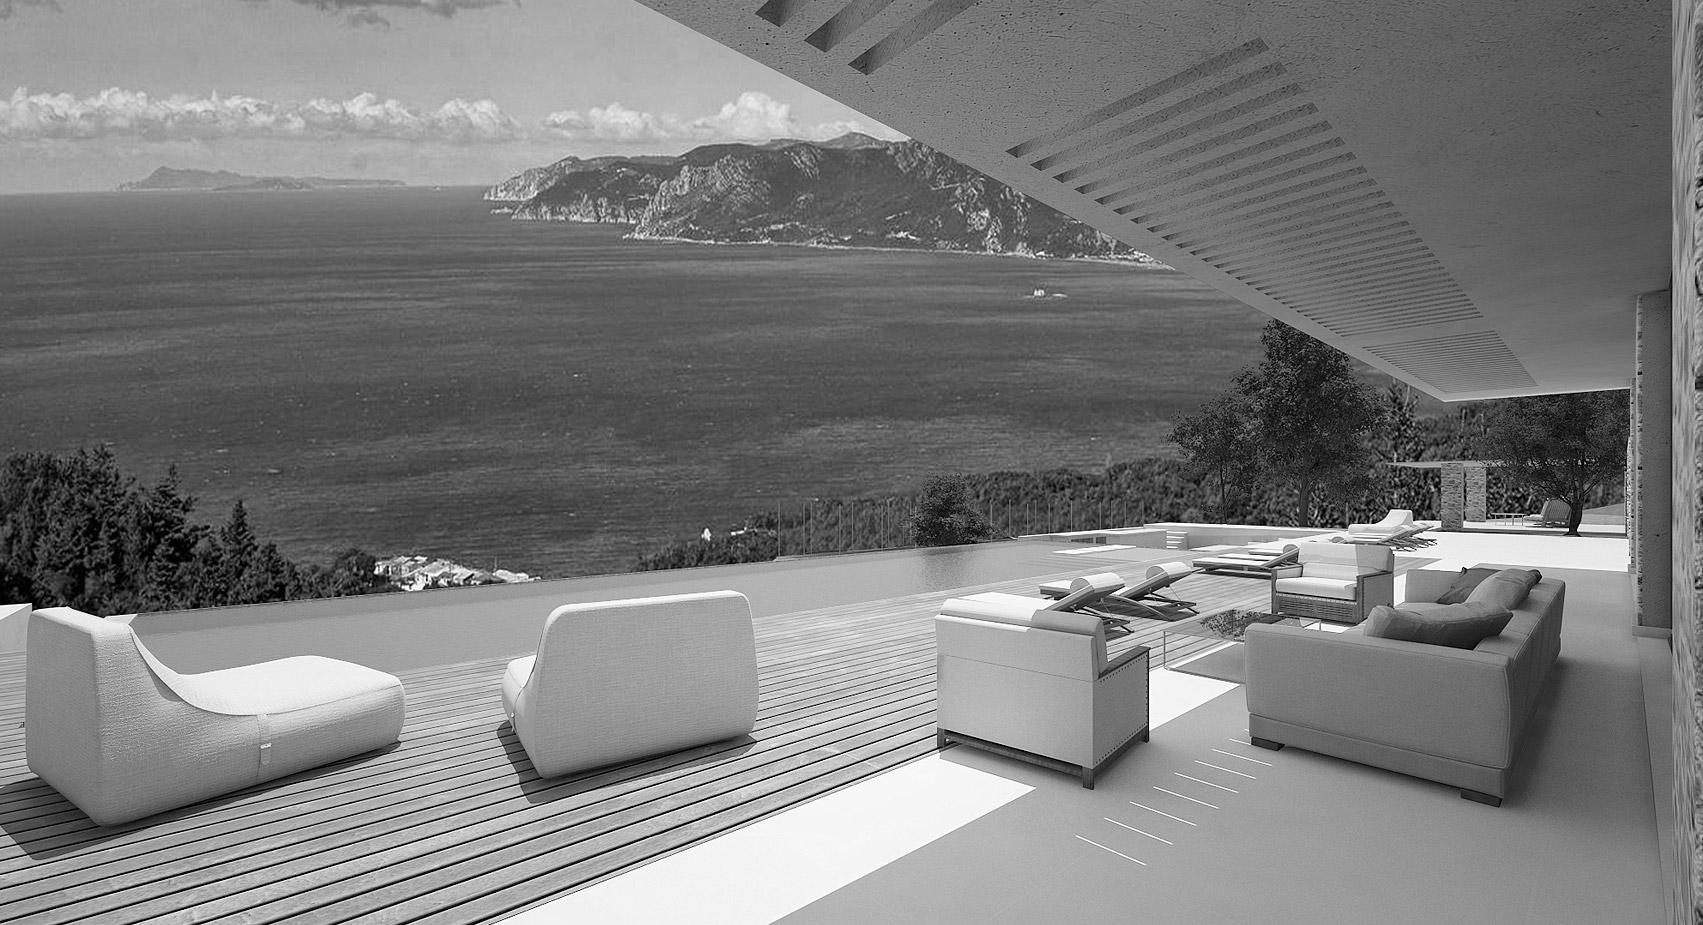 Stokas Construction - Αρχικτεκτονική Μελέτη, Κατασκευαστική, Interior Design